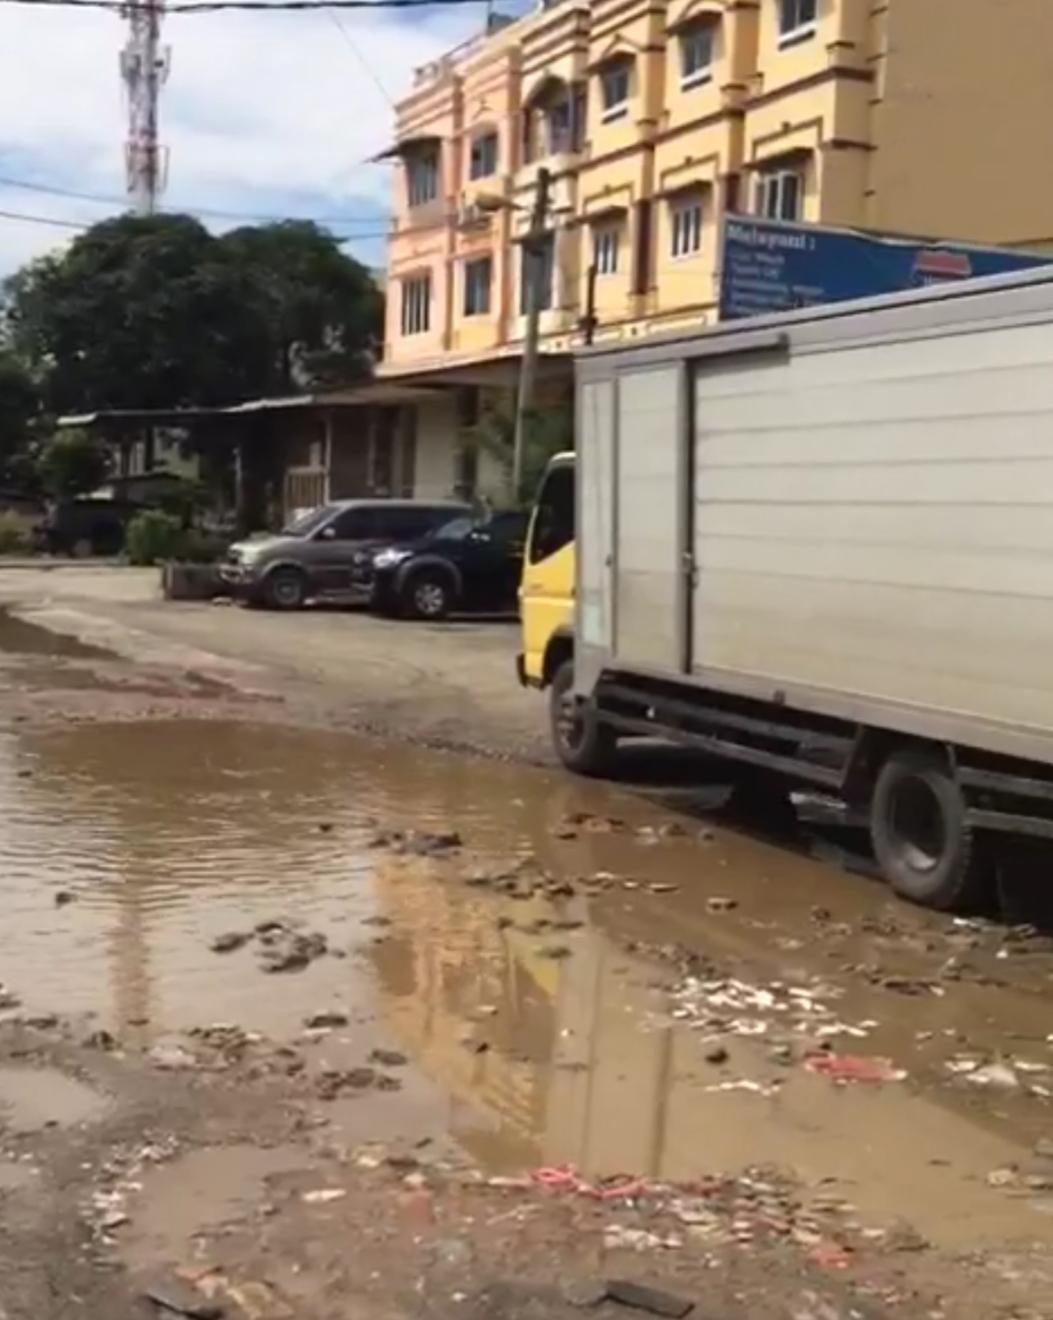 Hancur dan Berlobang, DPRD Medan Minta Pemko Perbaiki Jalan Madios, Jalan Negara dan Jalan GB.Josua